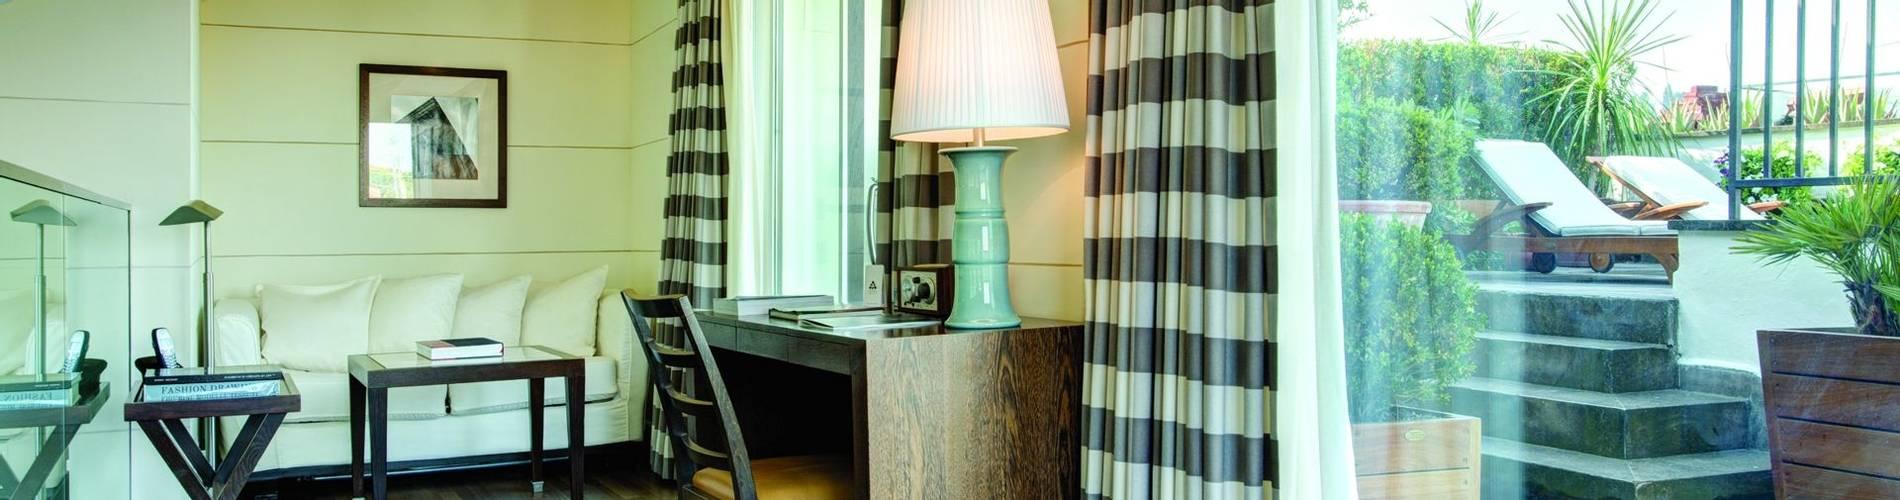 Gallery Art Hotel, Tuscany, Italy, Penthouse Pitti.JPG